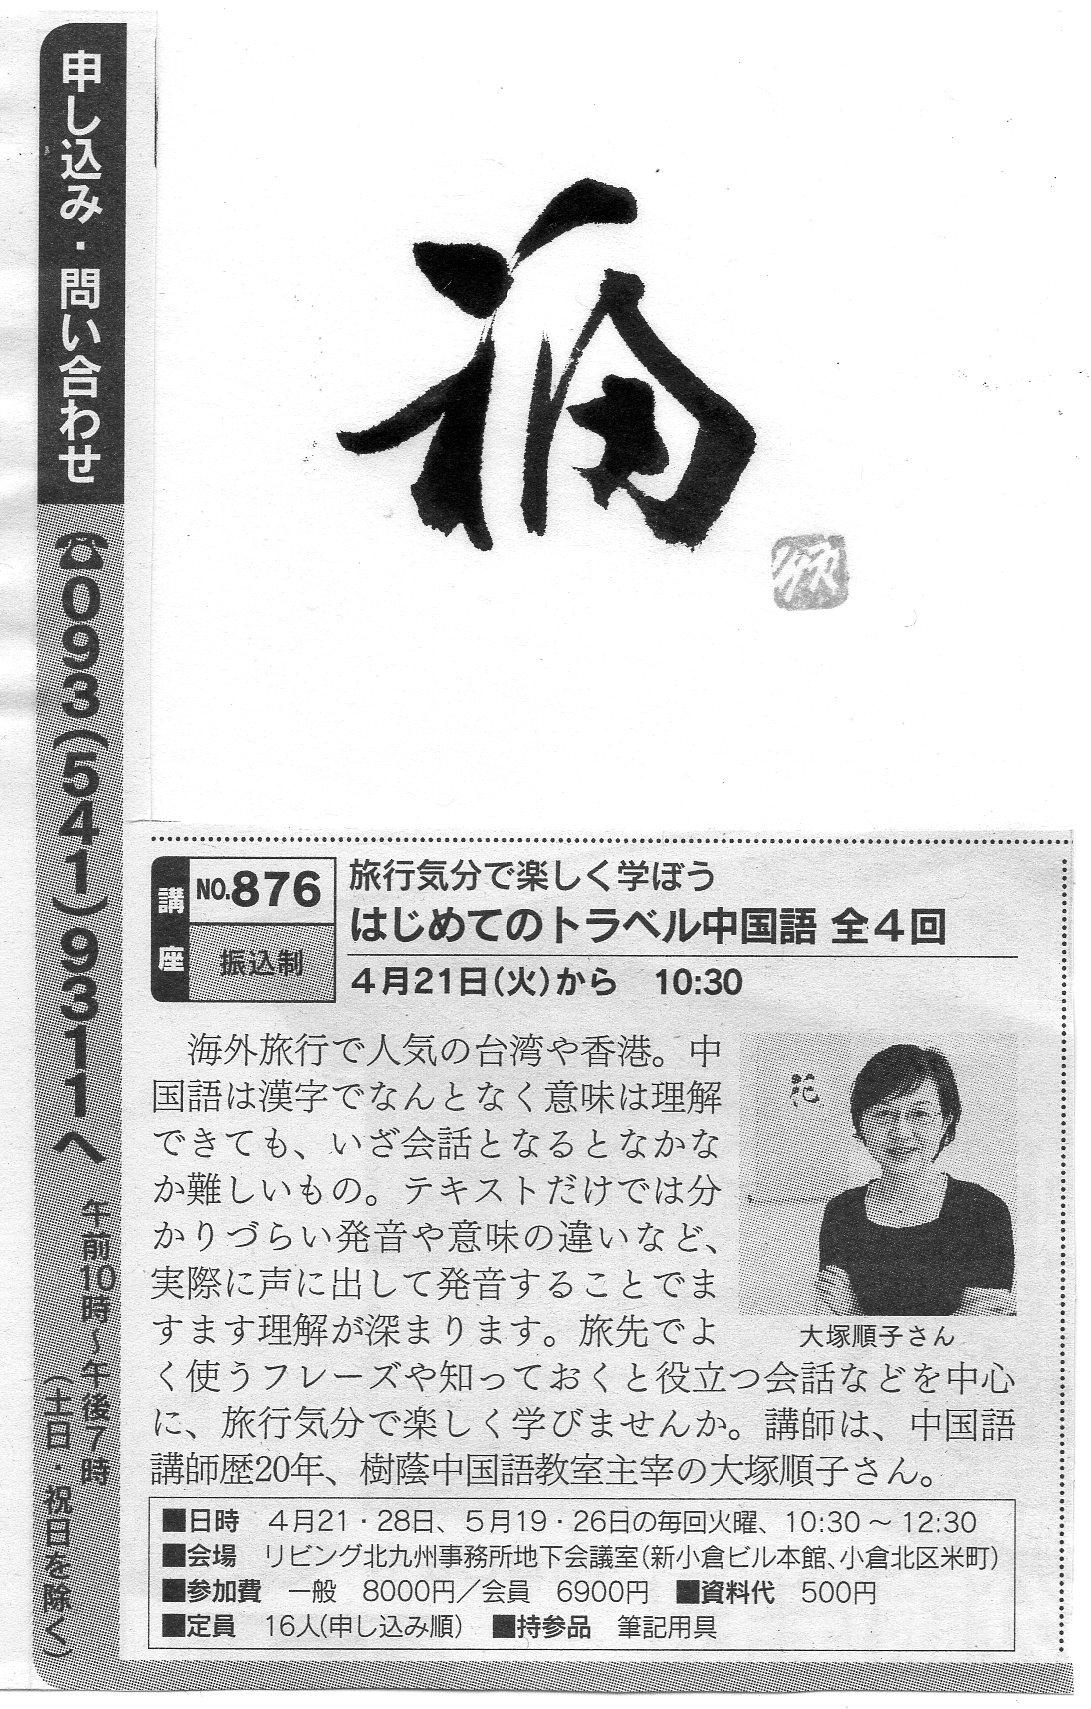 リビング北九州「中国語講座」受講生募集中!_d0325708_1294584.jpg